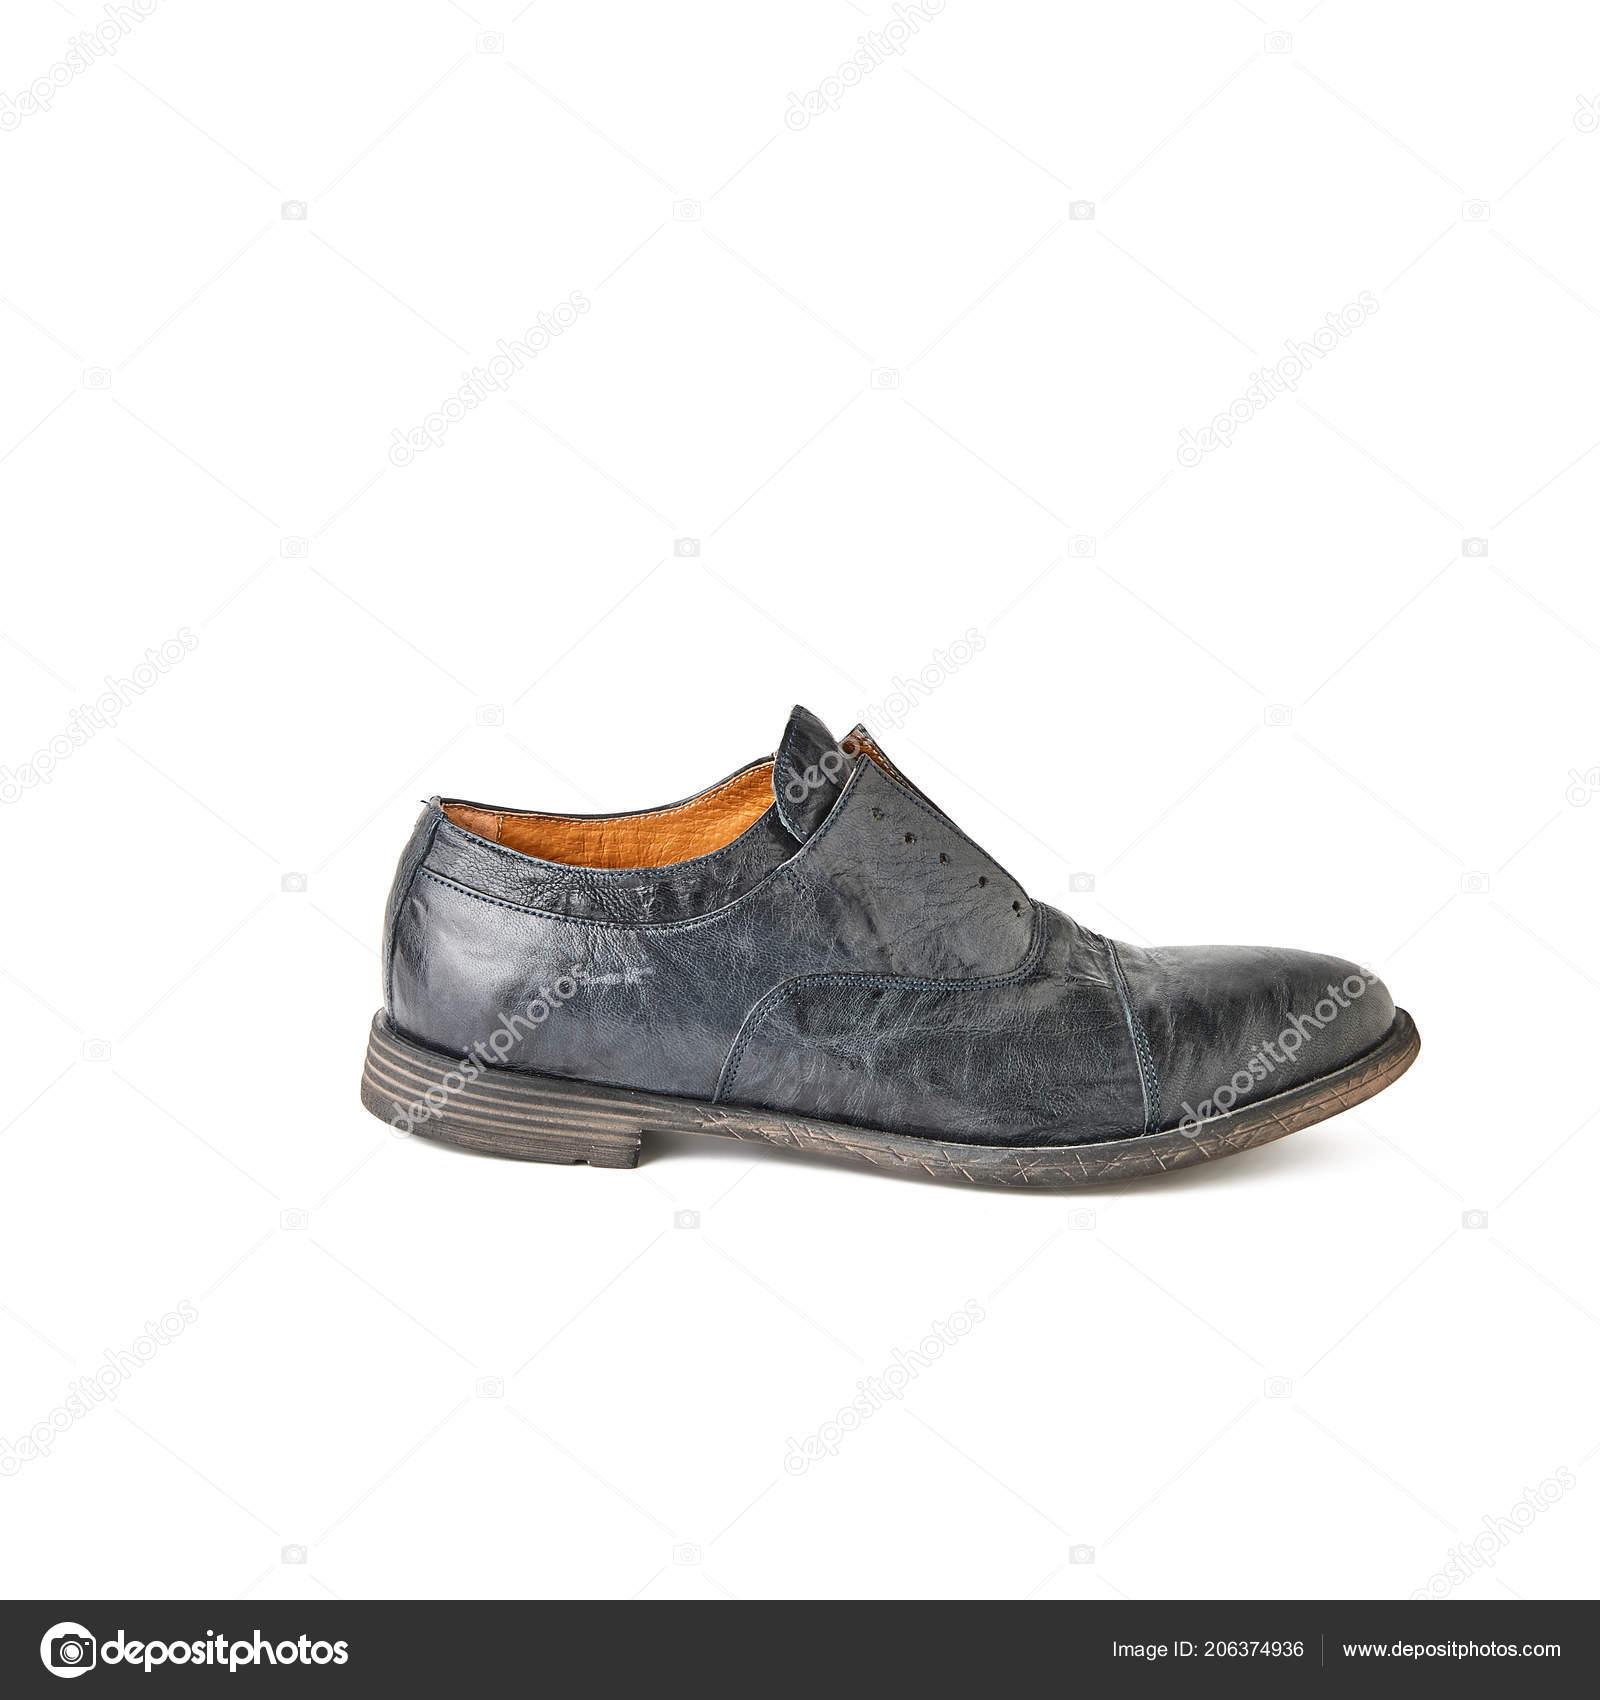 e5a68e8fed Elegante Negro Laceless Zapato Estudio Tiro Fondo Blanco — Fotos de Stock